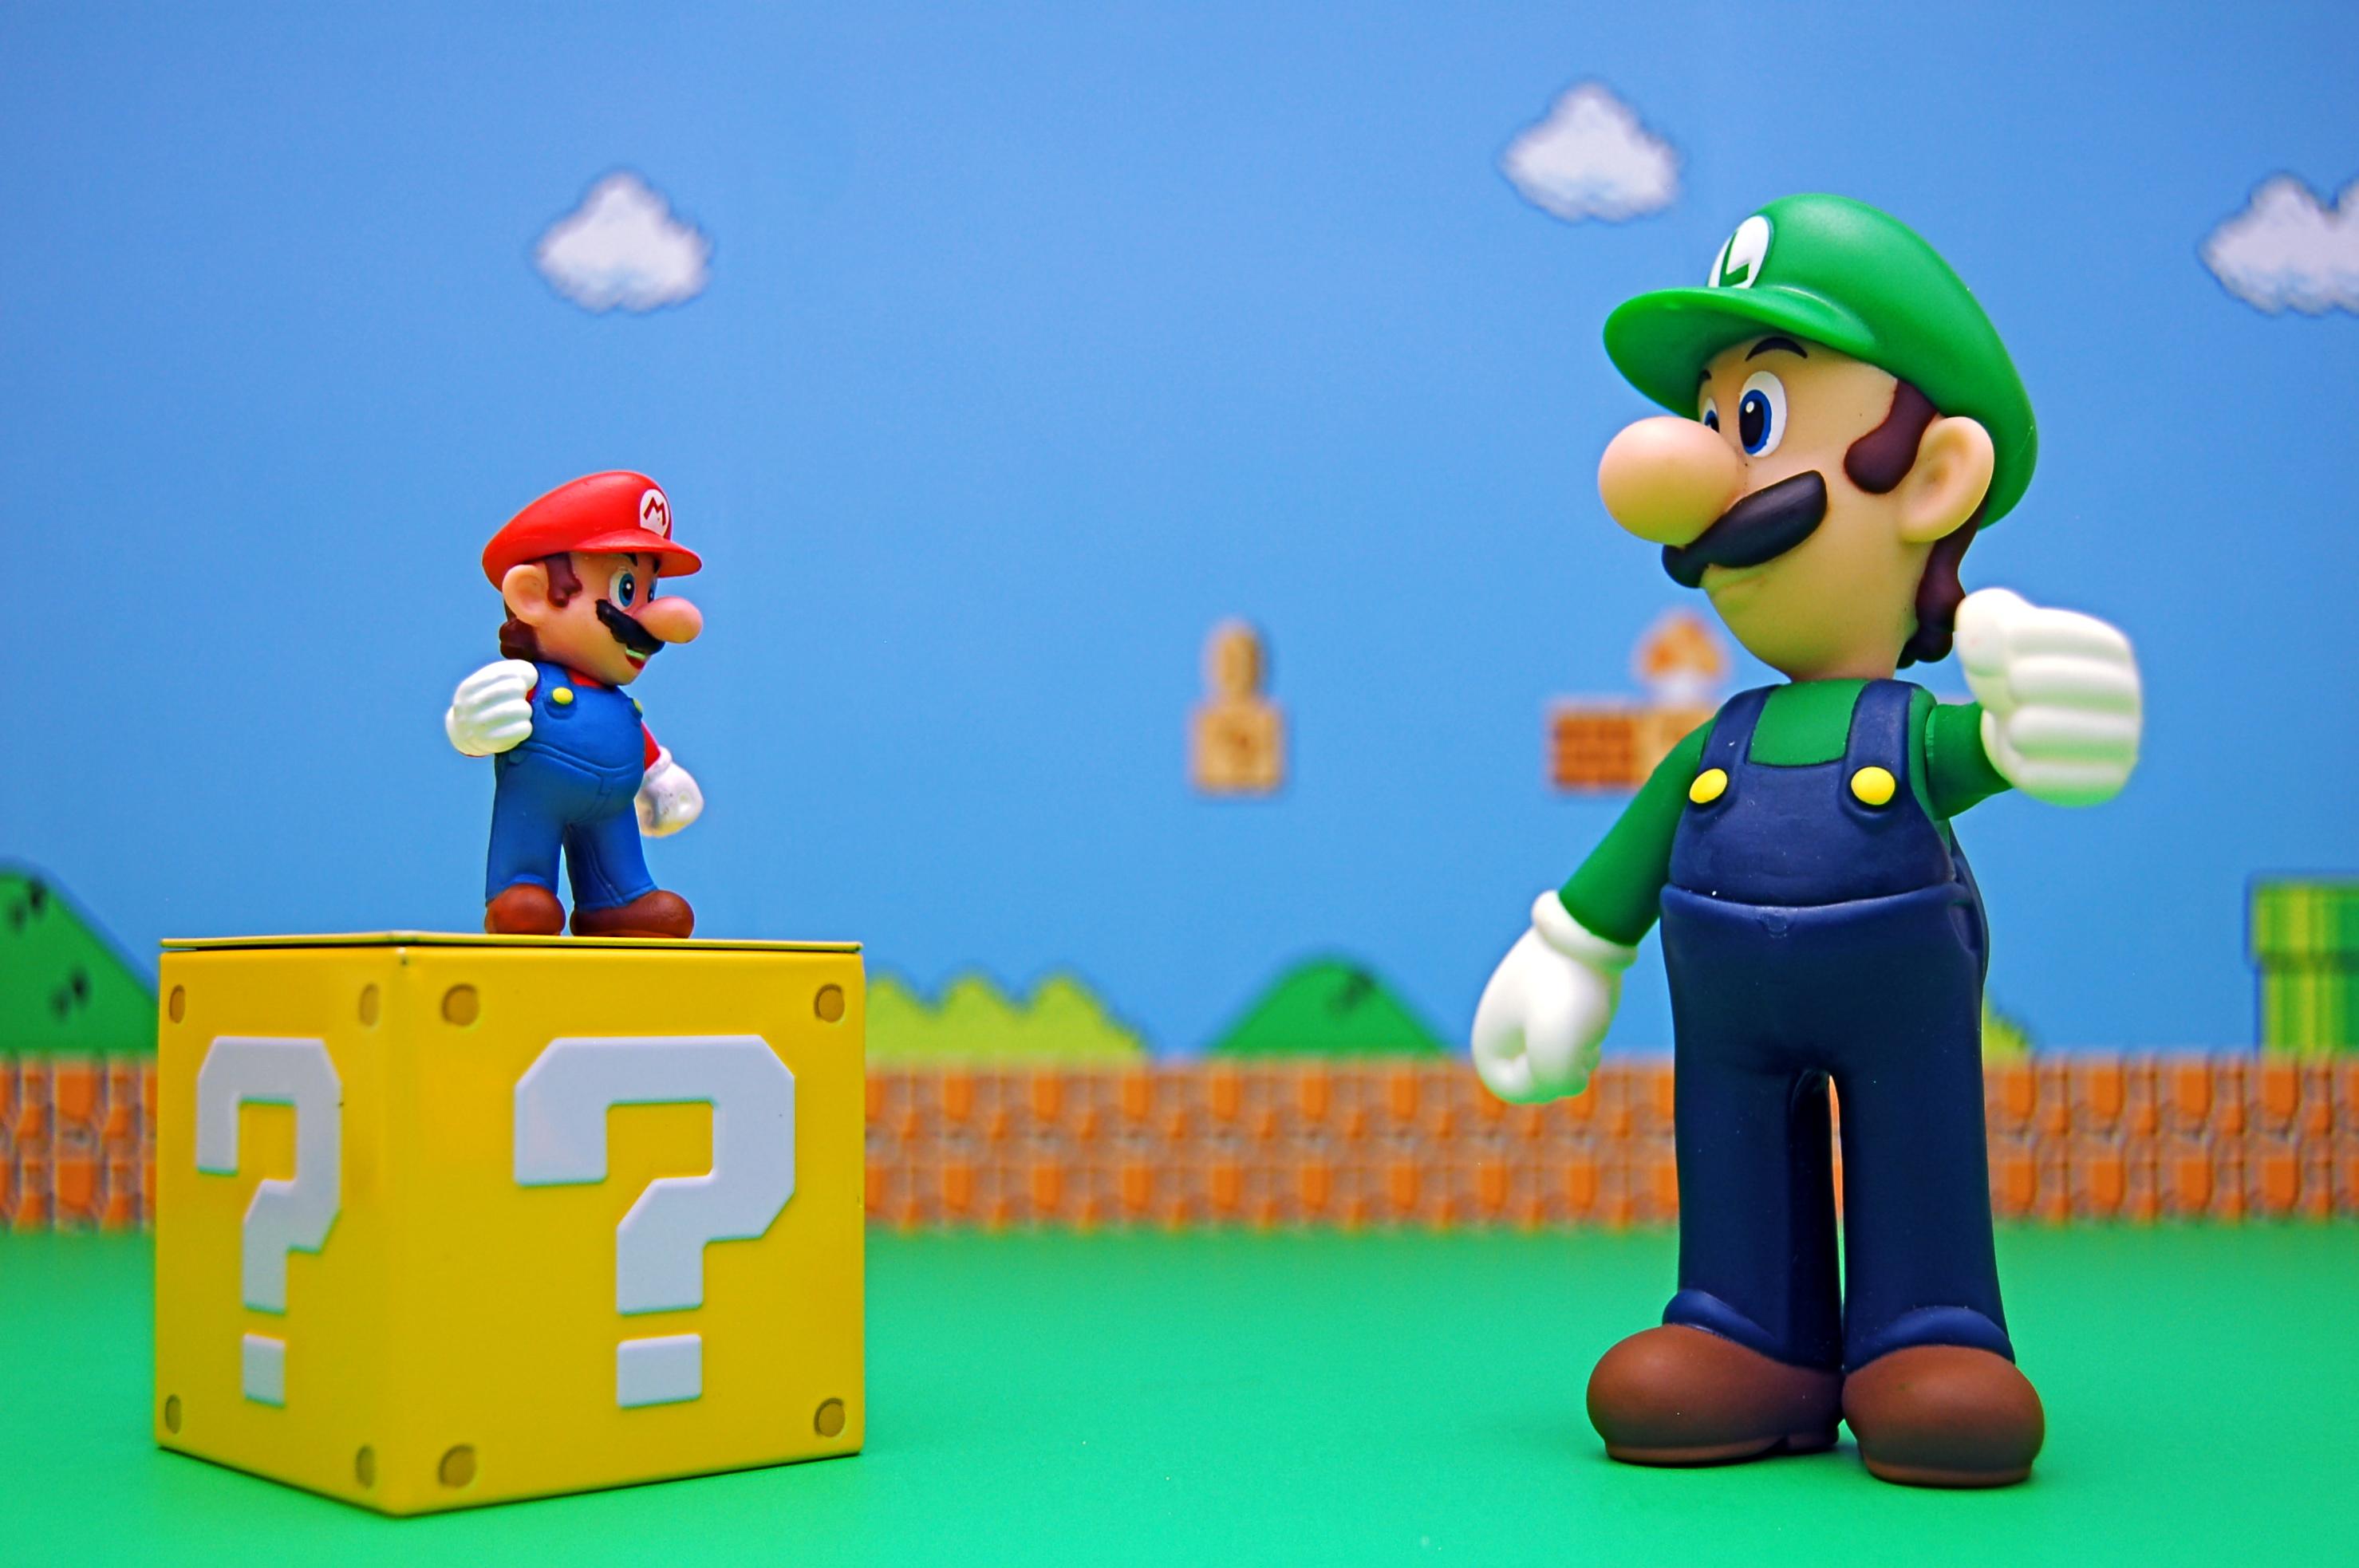 Wallpaper Irasi Langit Awan Gambar Kartun Mainan Nintendo Bermain Luigi Favorit 5k Por Besar Angka Baik Foto Tindakan Video